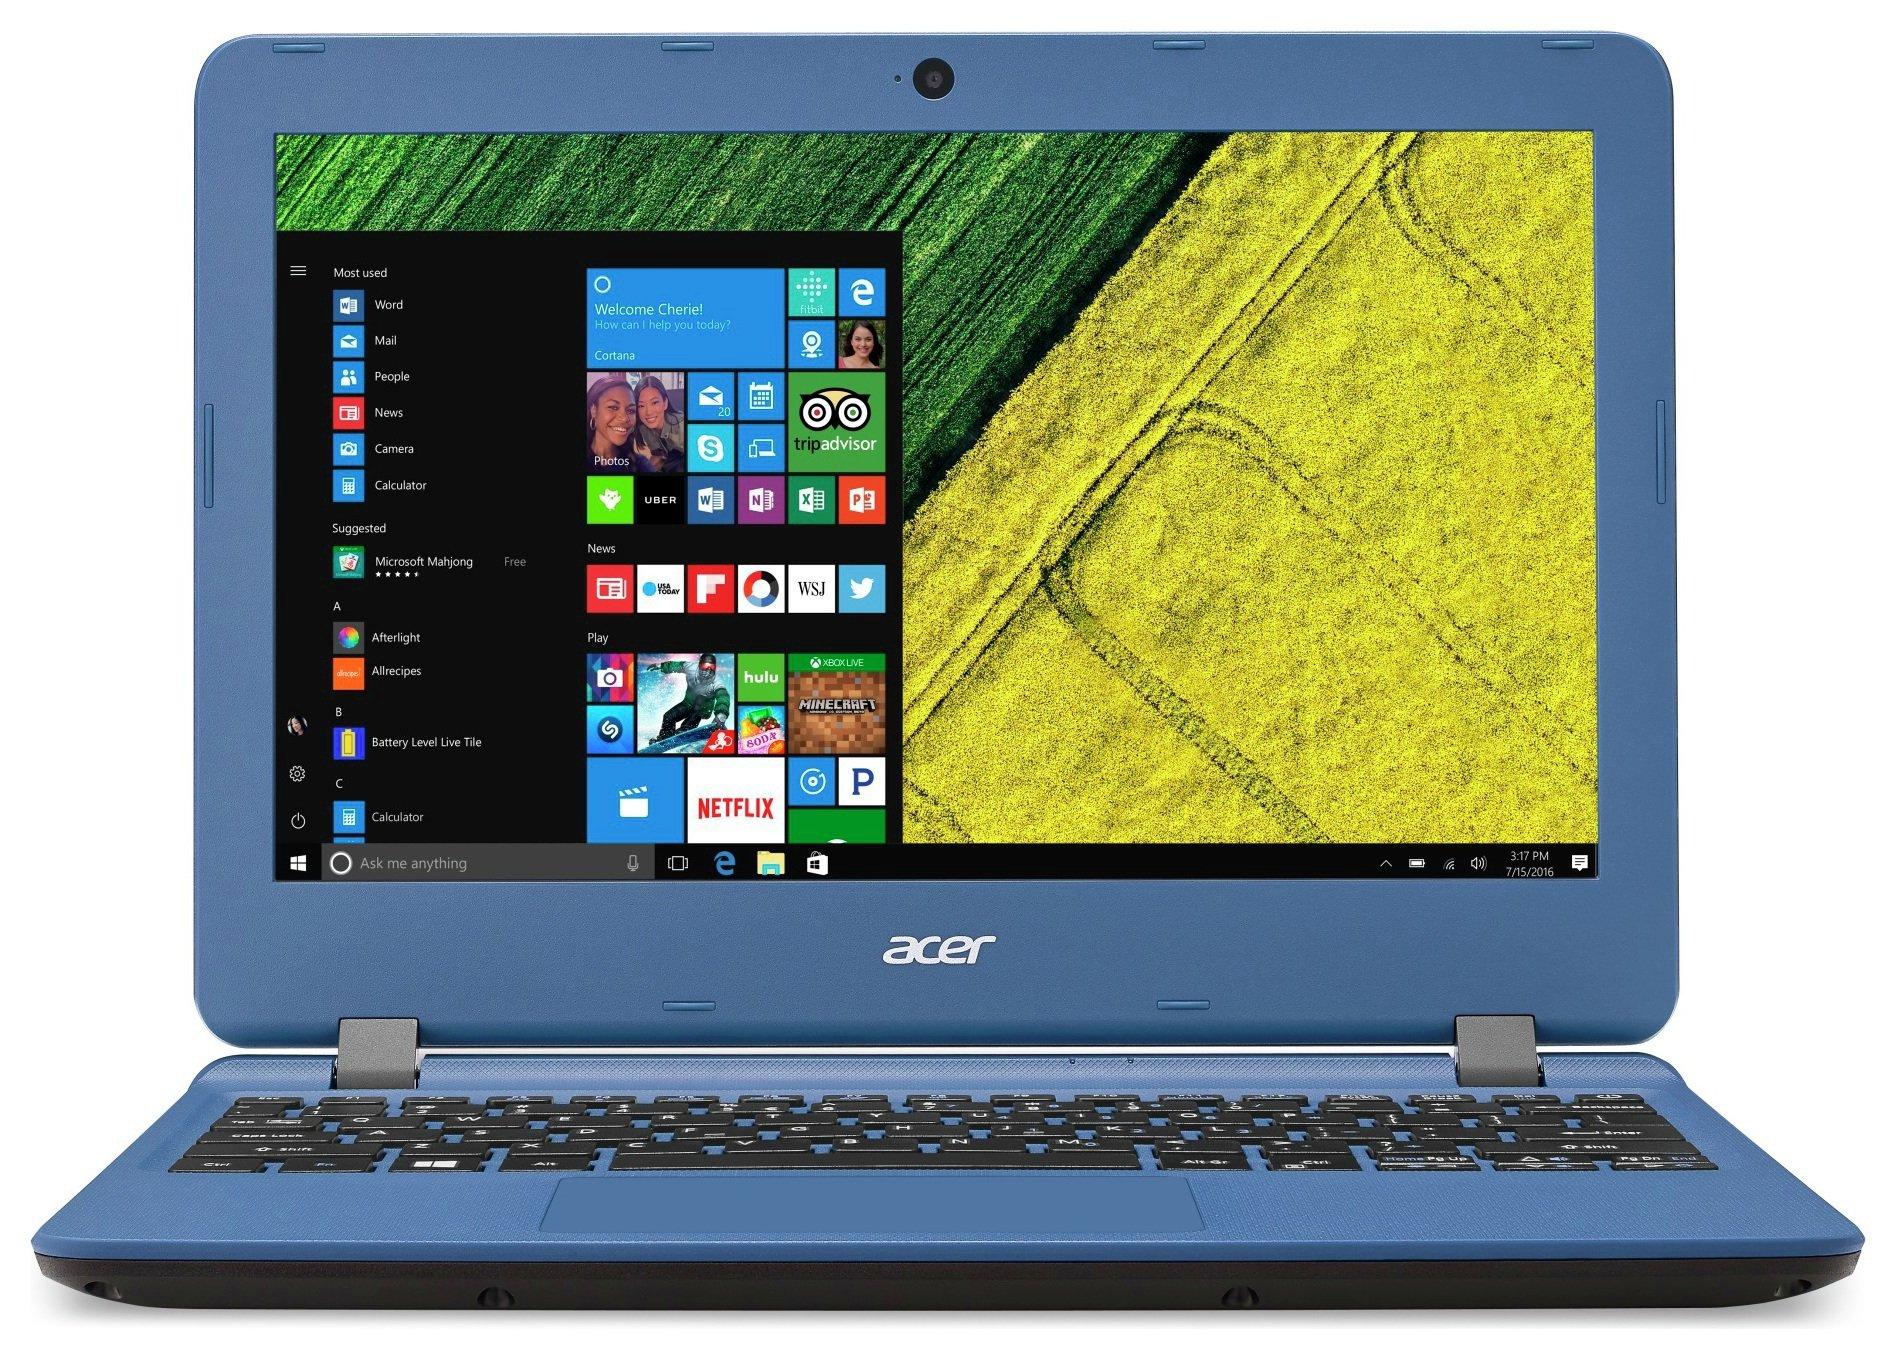 Sale On Acer Aspire Es 11 6 Inch Celeron 4gb 32gb Laptop